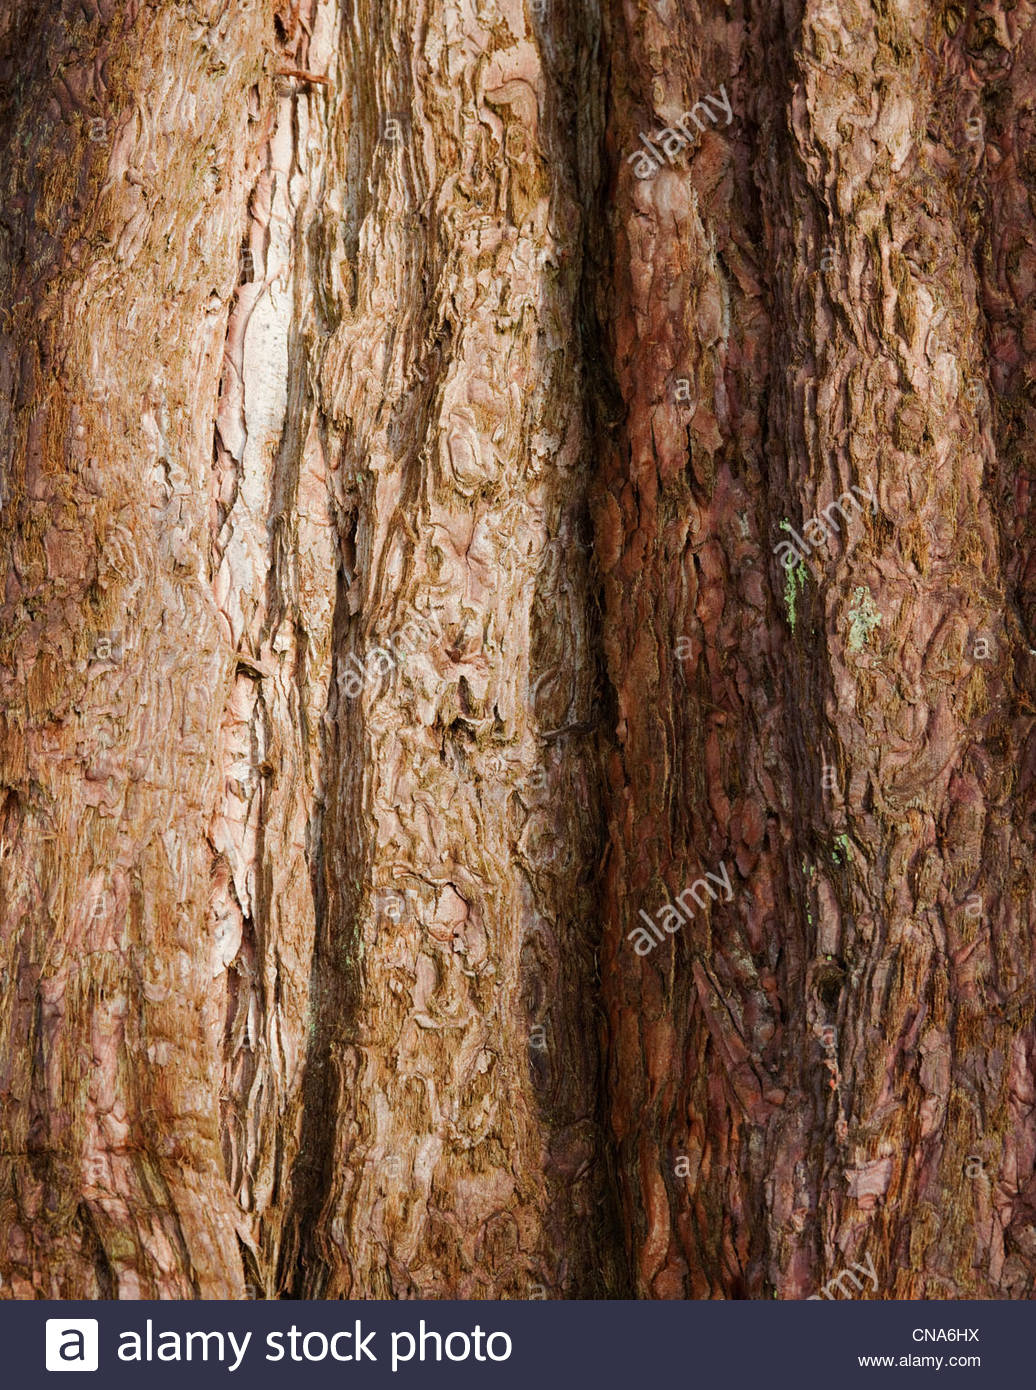 Sequoiadendron giganteum (Wellingtonia, giant sequoia, giant redwood) - Stock Image